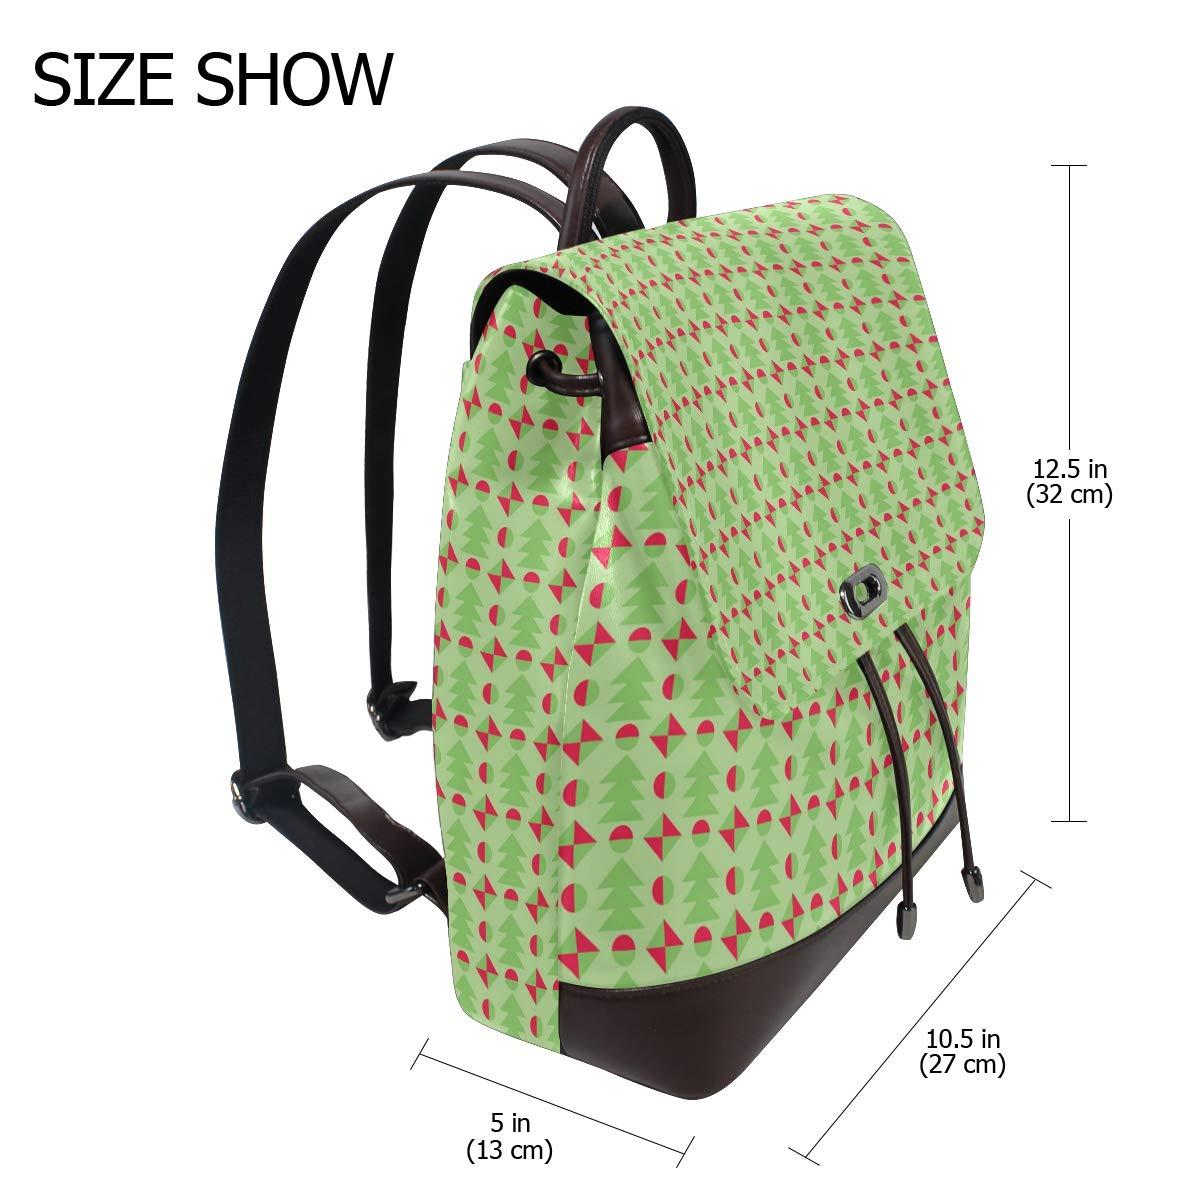 Unisex PU Leather Backpack Retro Christmas Green Xmas Print Womens Casual Daypack Mens Travel Sports Bag Boys College Bookbag